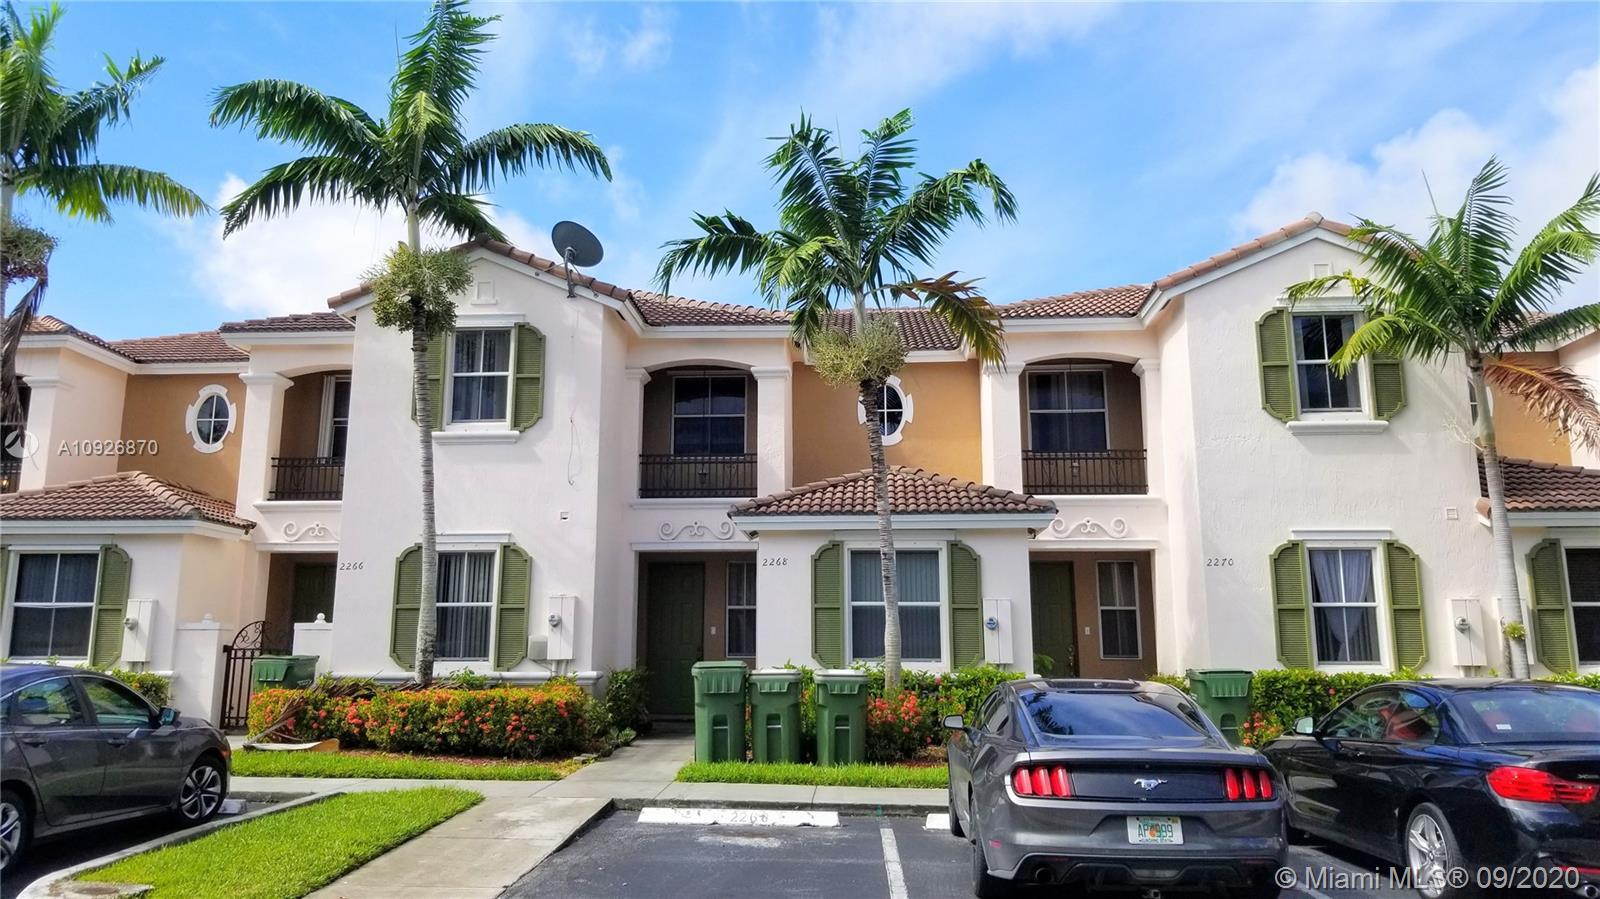 2268 NE 42nd Cir Property Photo